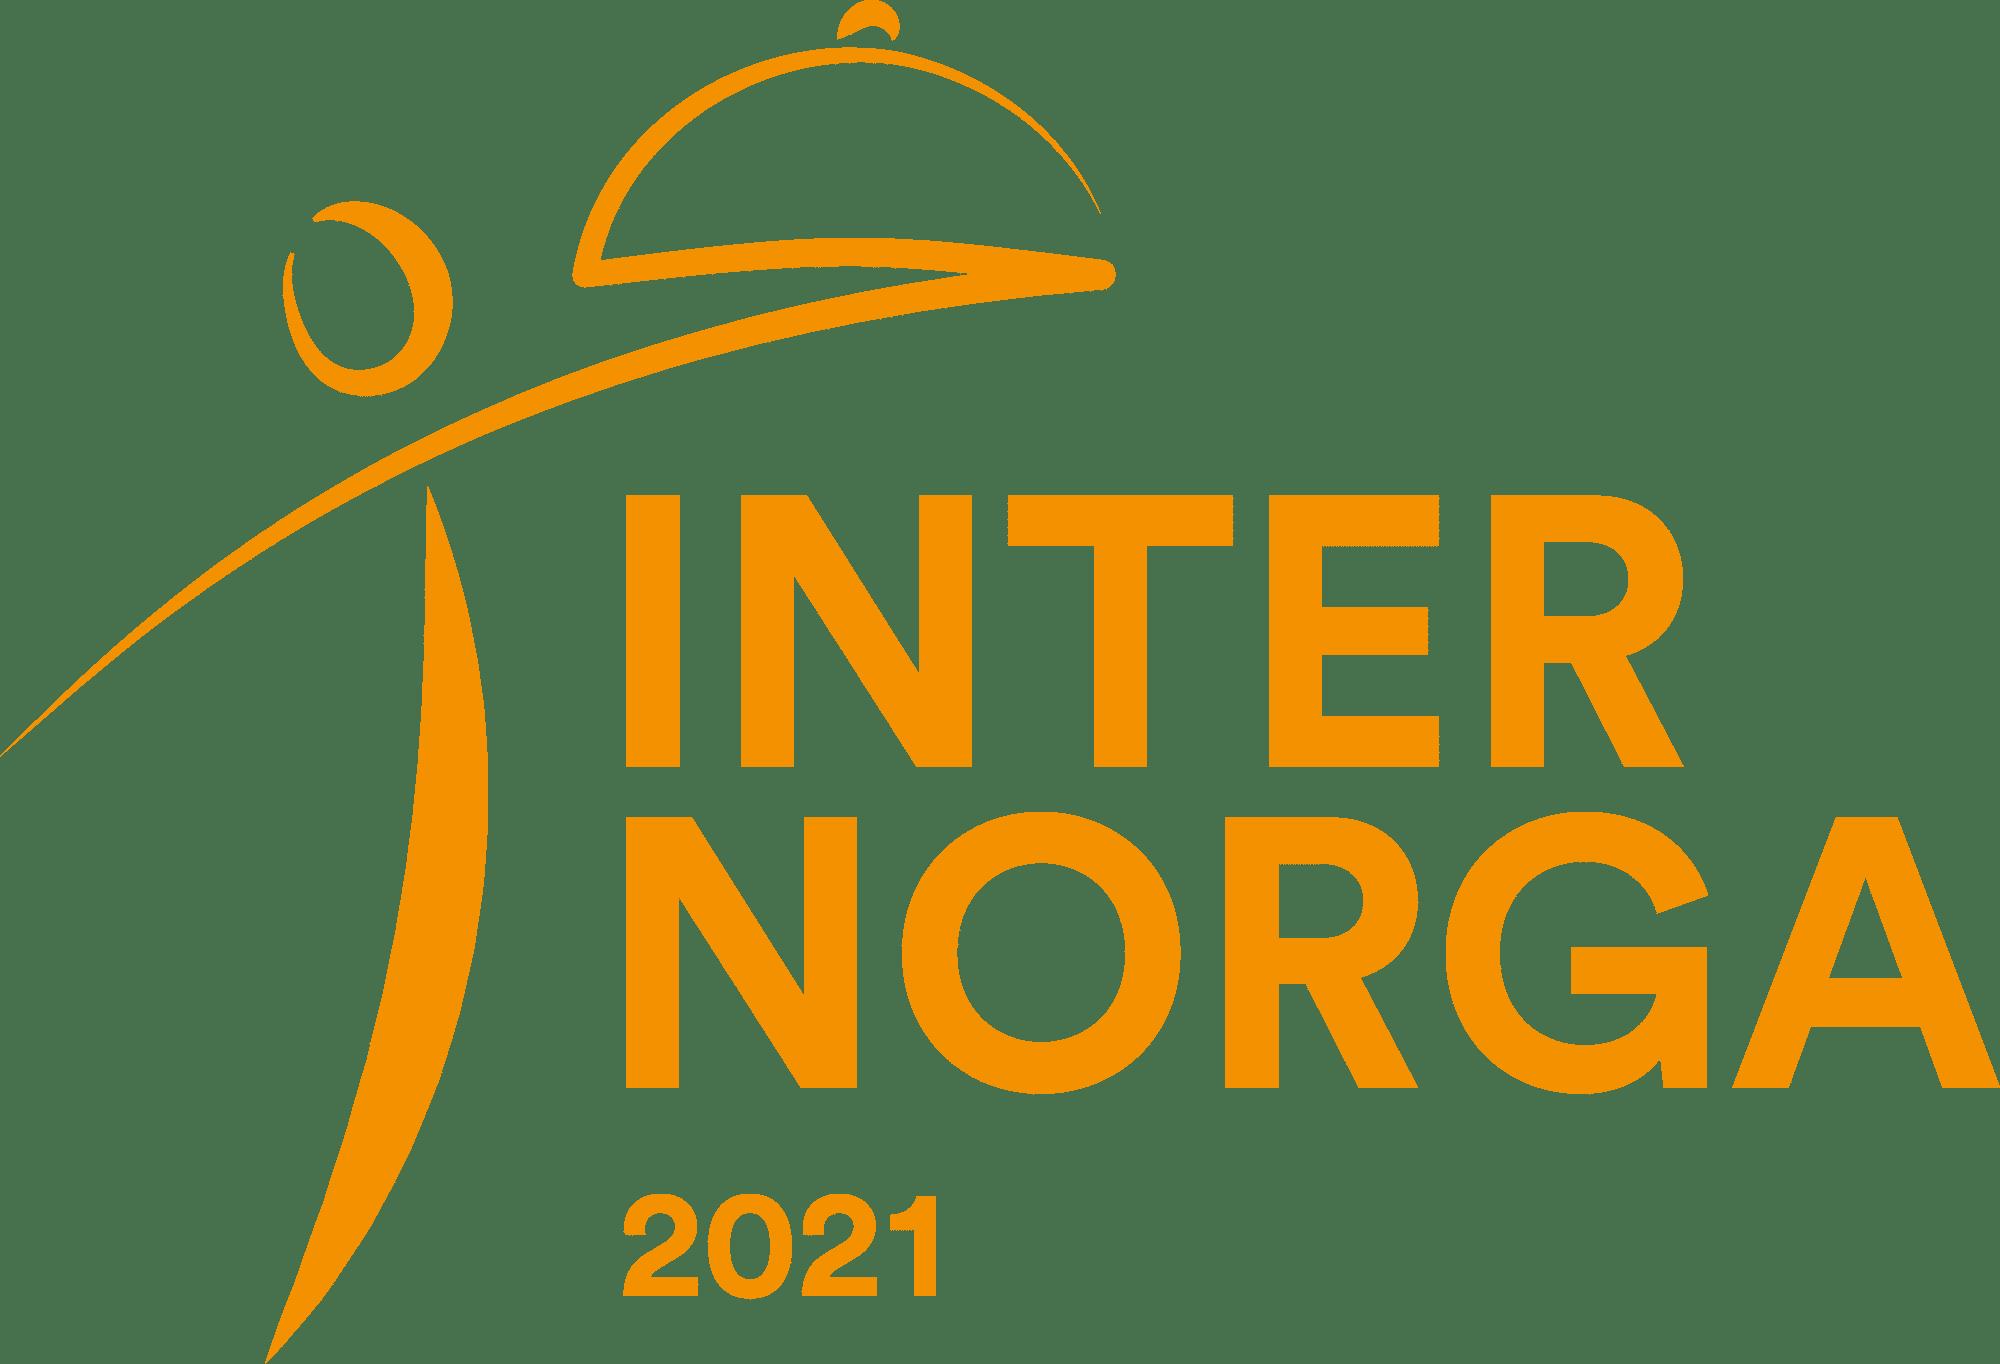 INTERORGA 2021